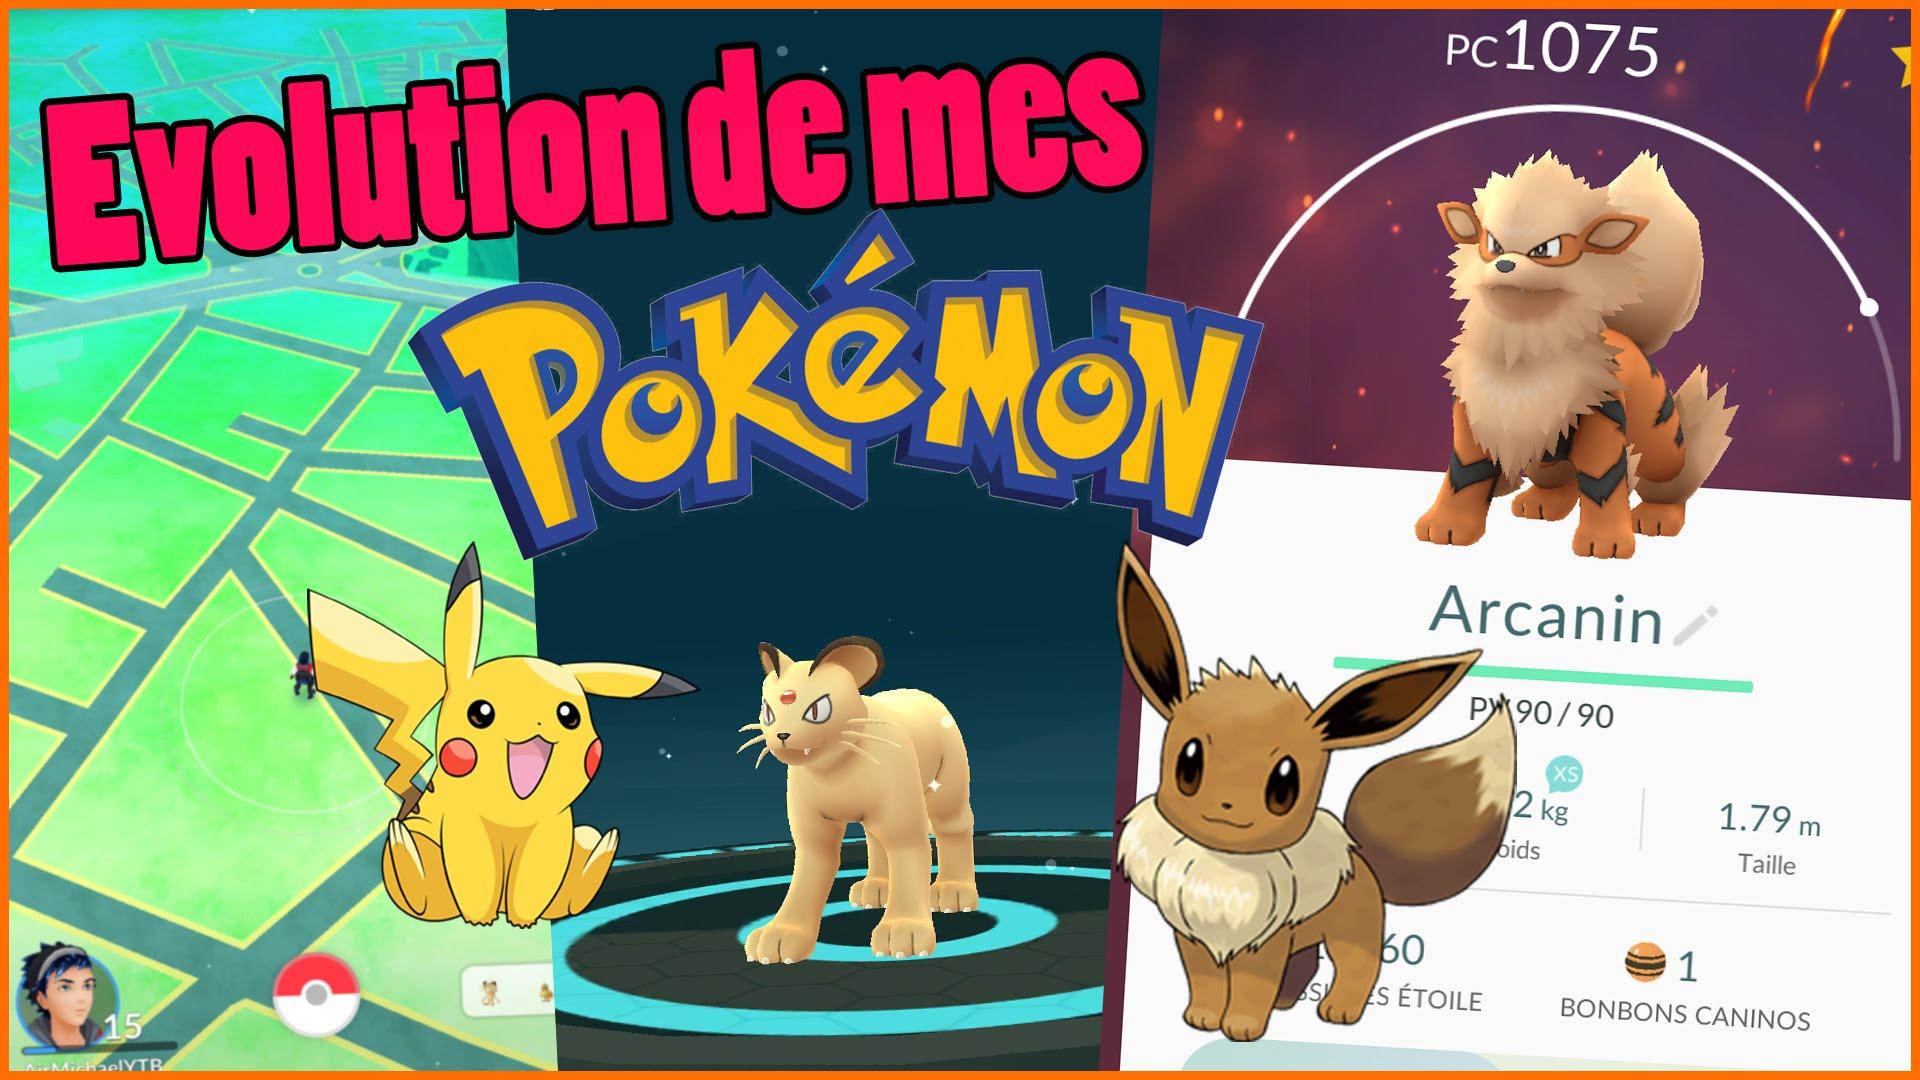 J'EVOLUE TOUS MES POKEMONS ! XP EN MASSE ! Pokémon GO# 2.